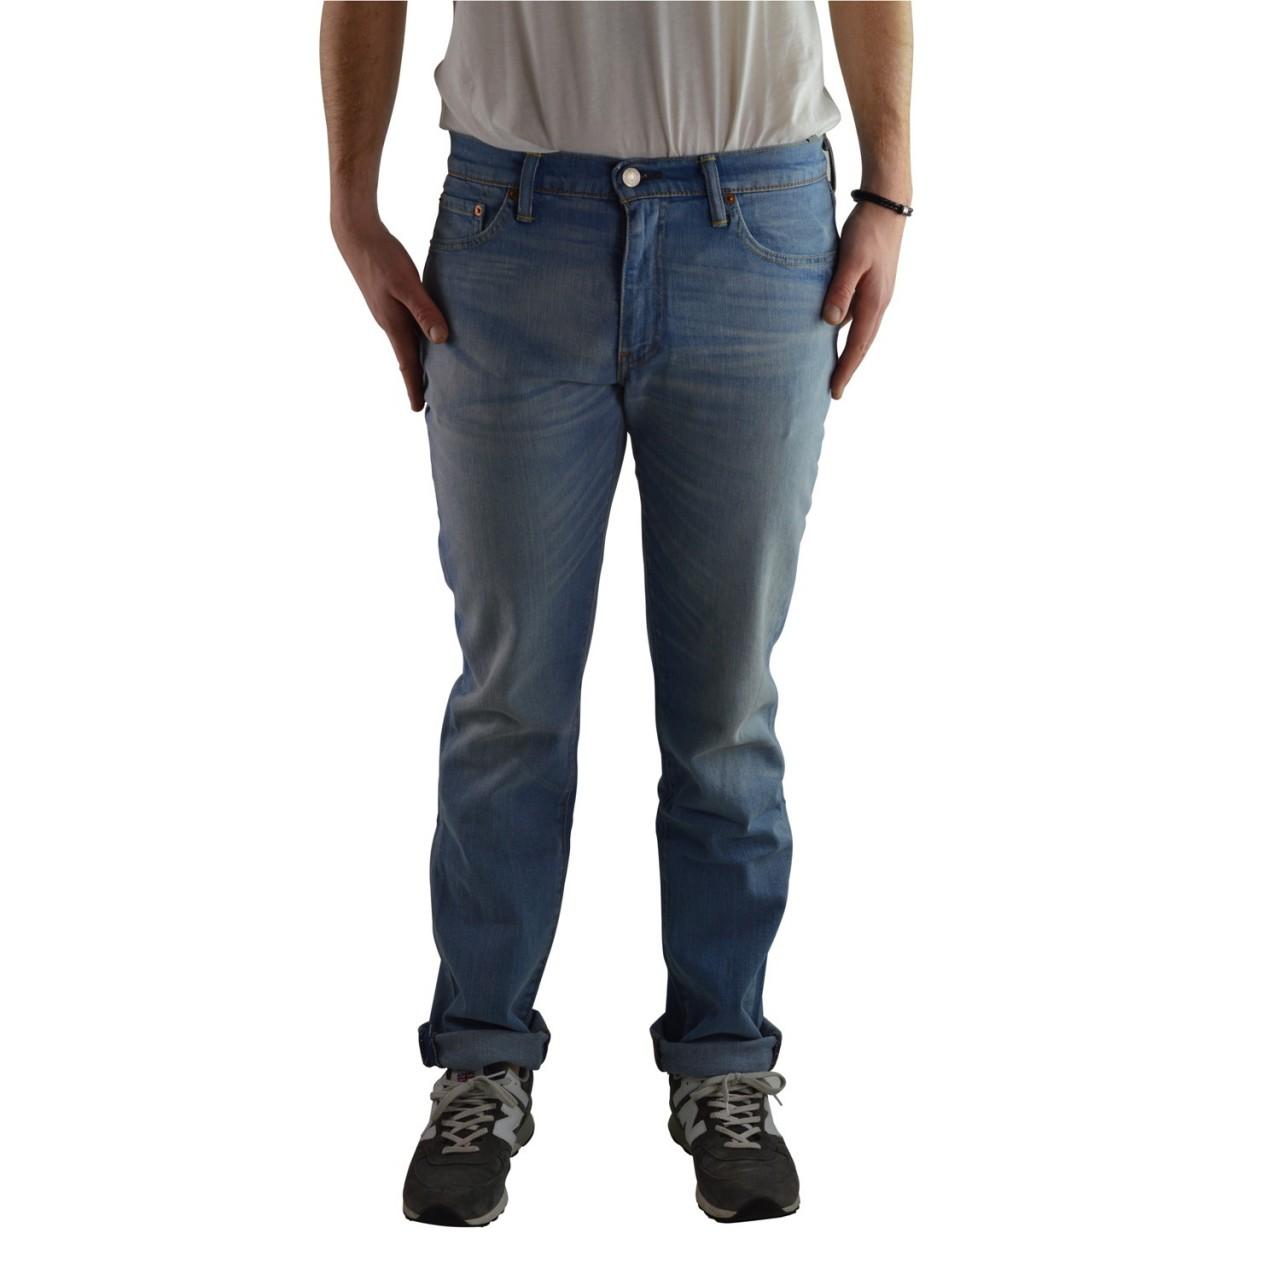 Levi's Uomo Jeans Levi's Uomo 511 Slim Fit Aber 5111541B